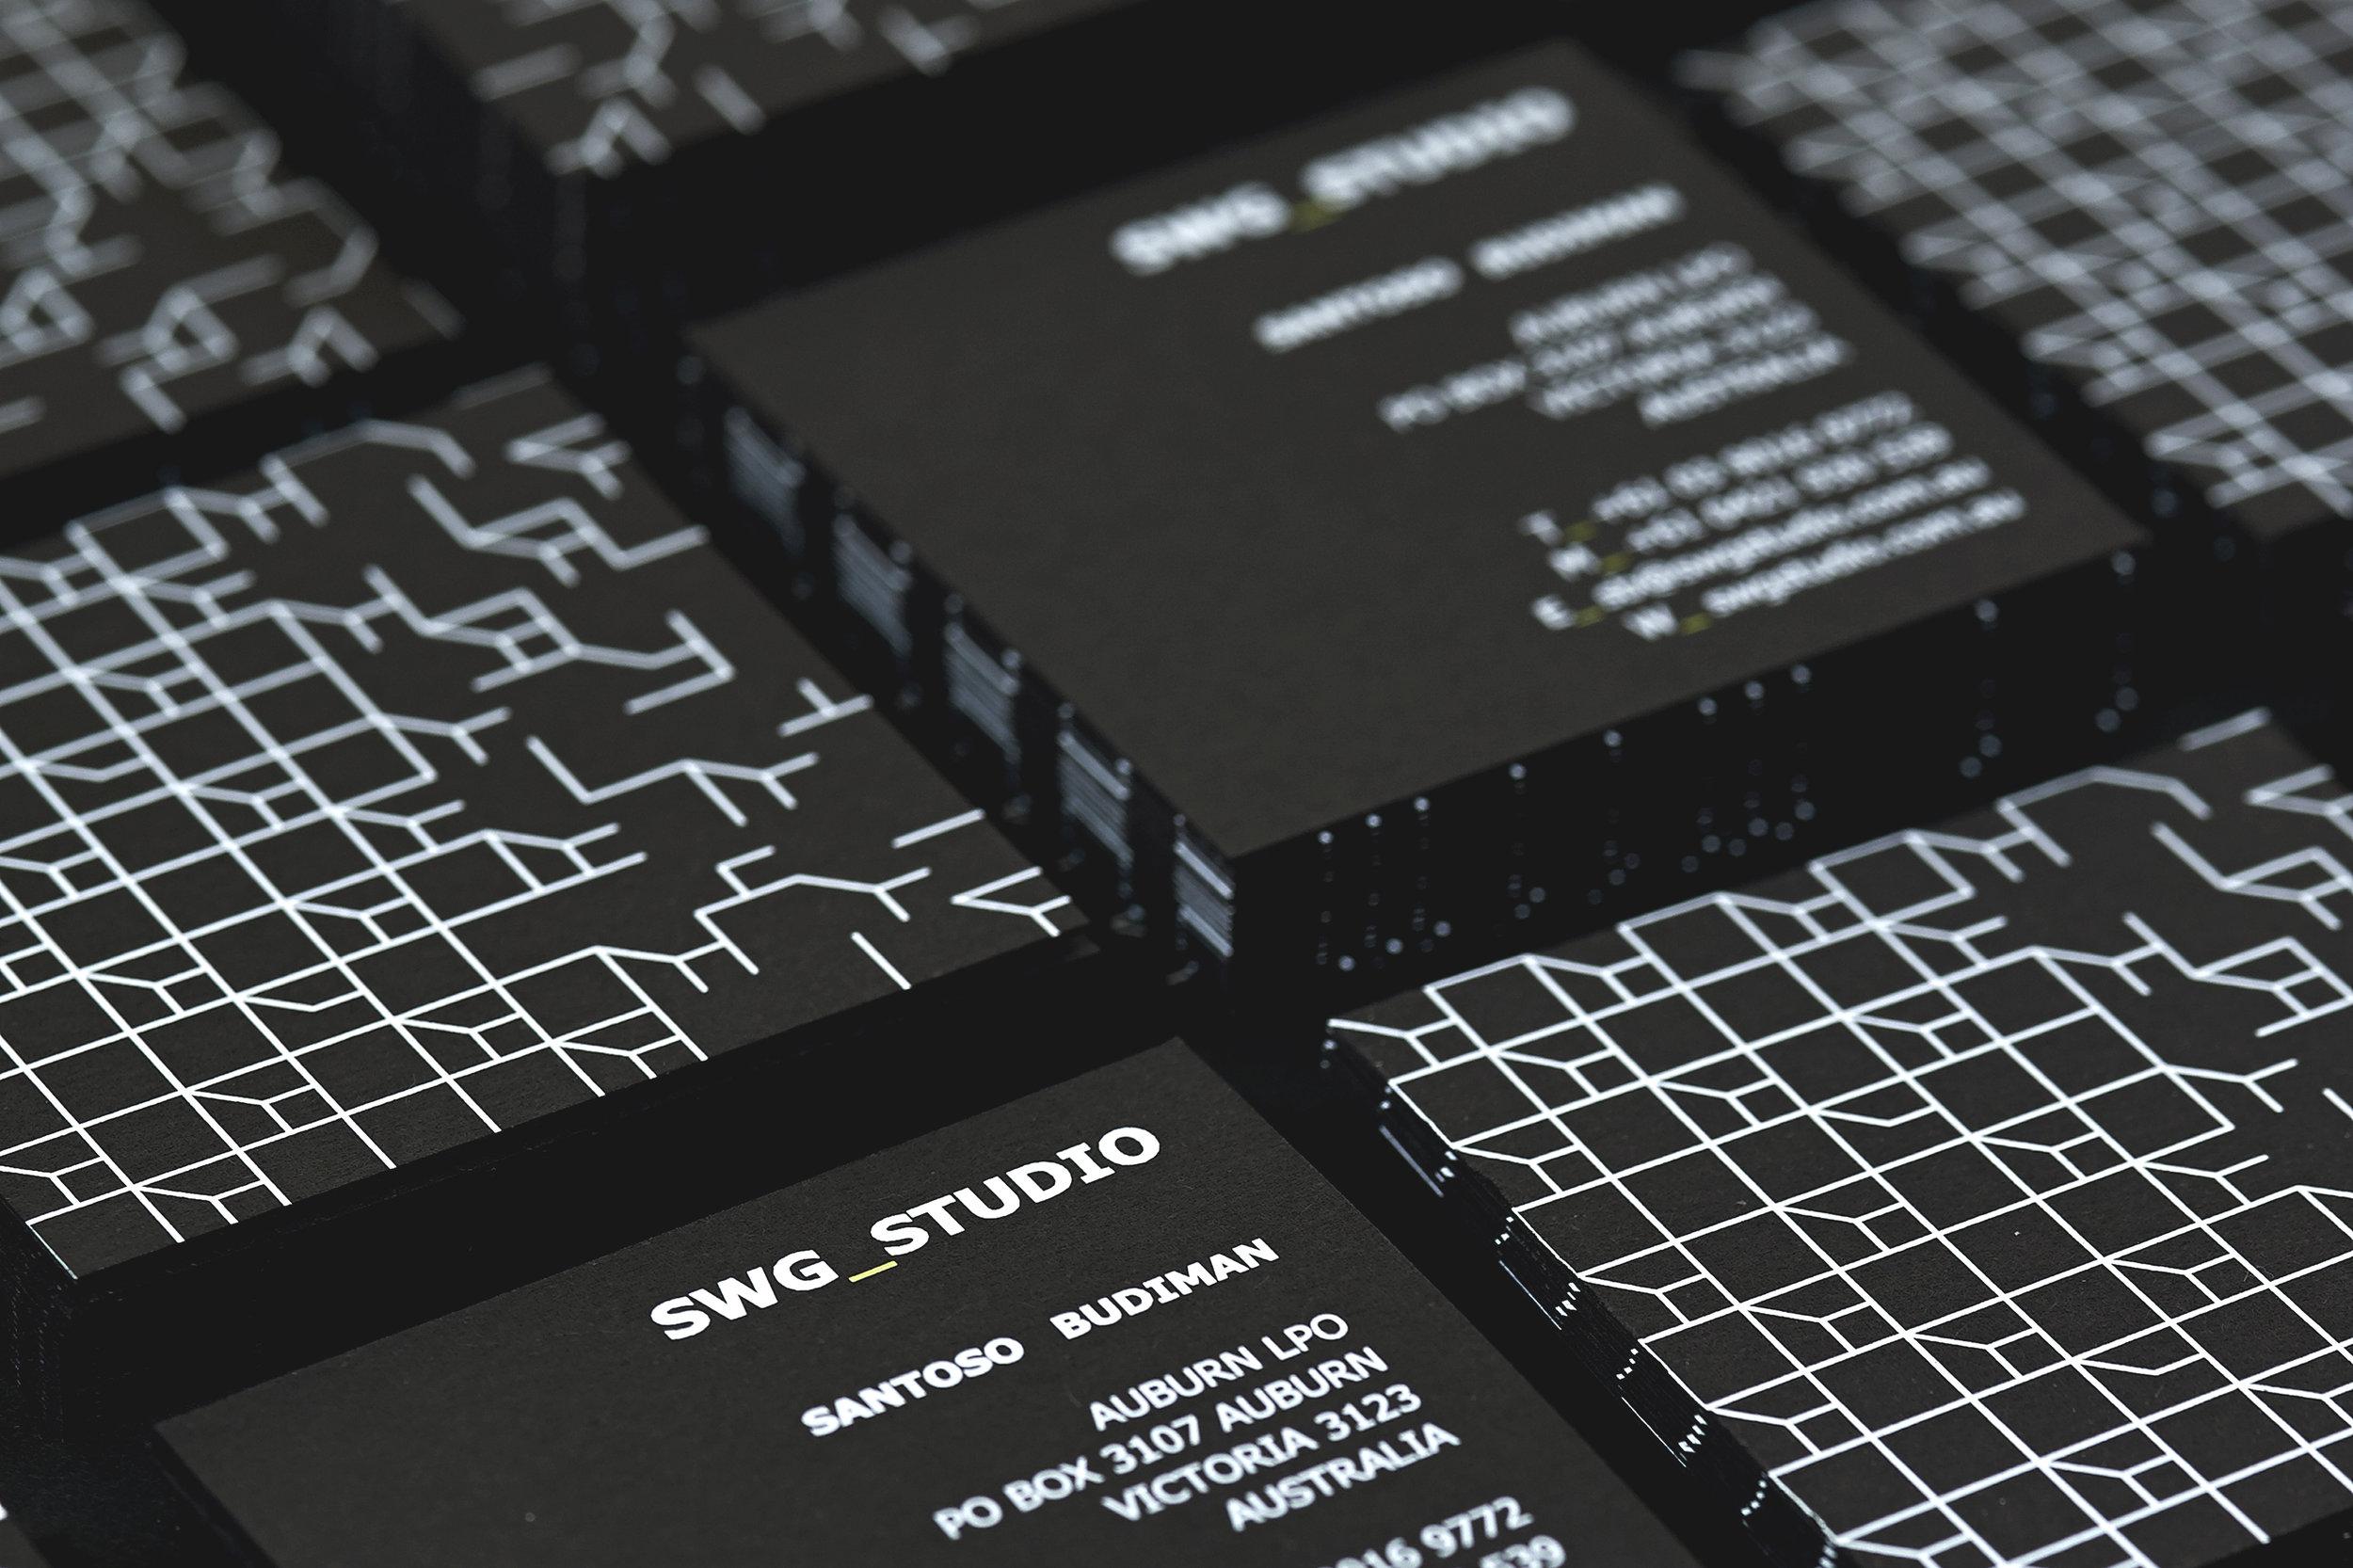 SWG STUDIO INTERDISCIPLINARY DESIGN STUDIO BASED IN MELBOURNE